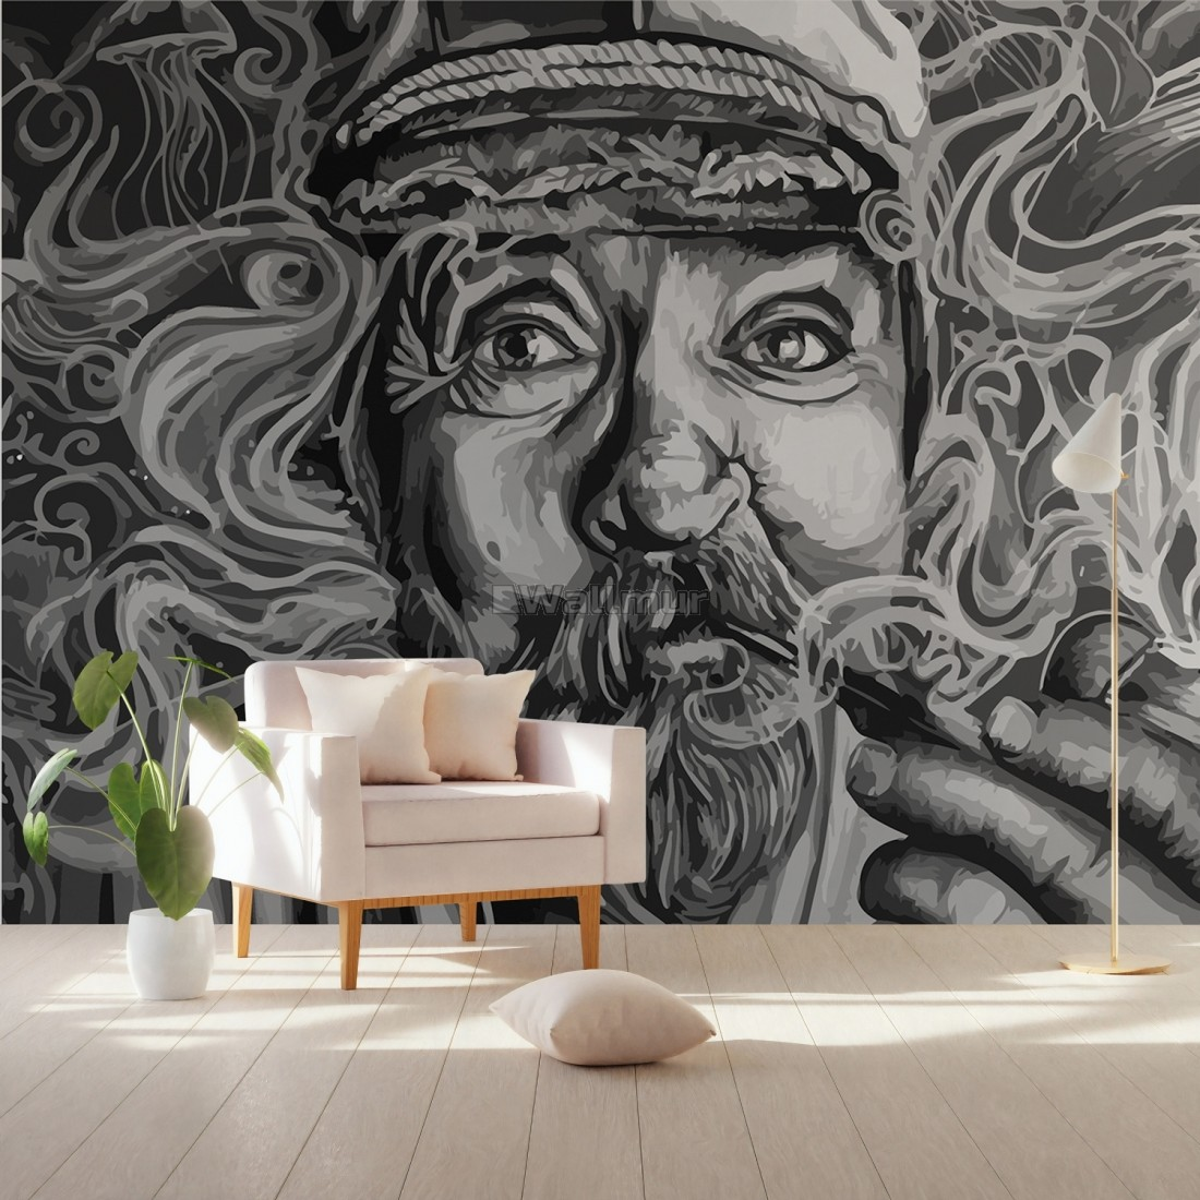 Grayscale Smoker Man Wallpaper Mural